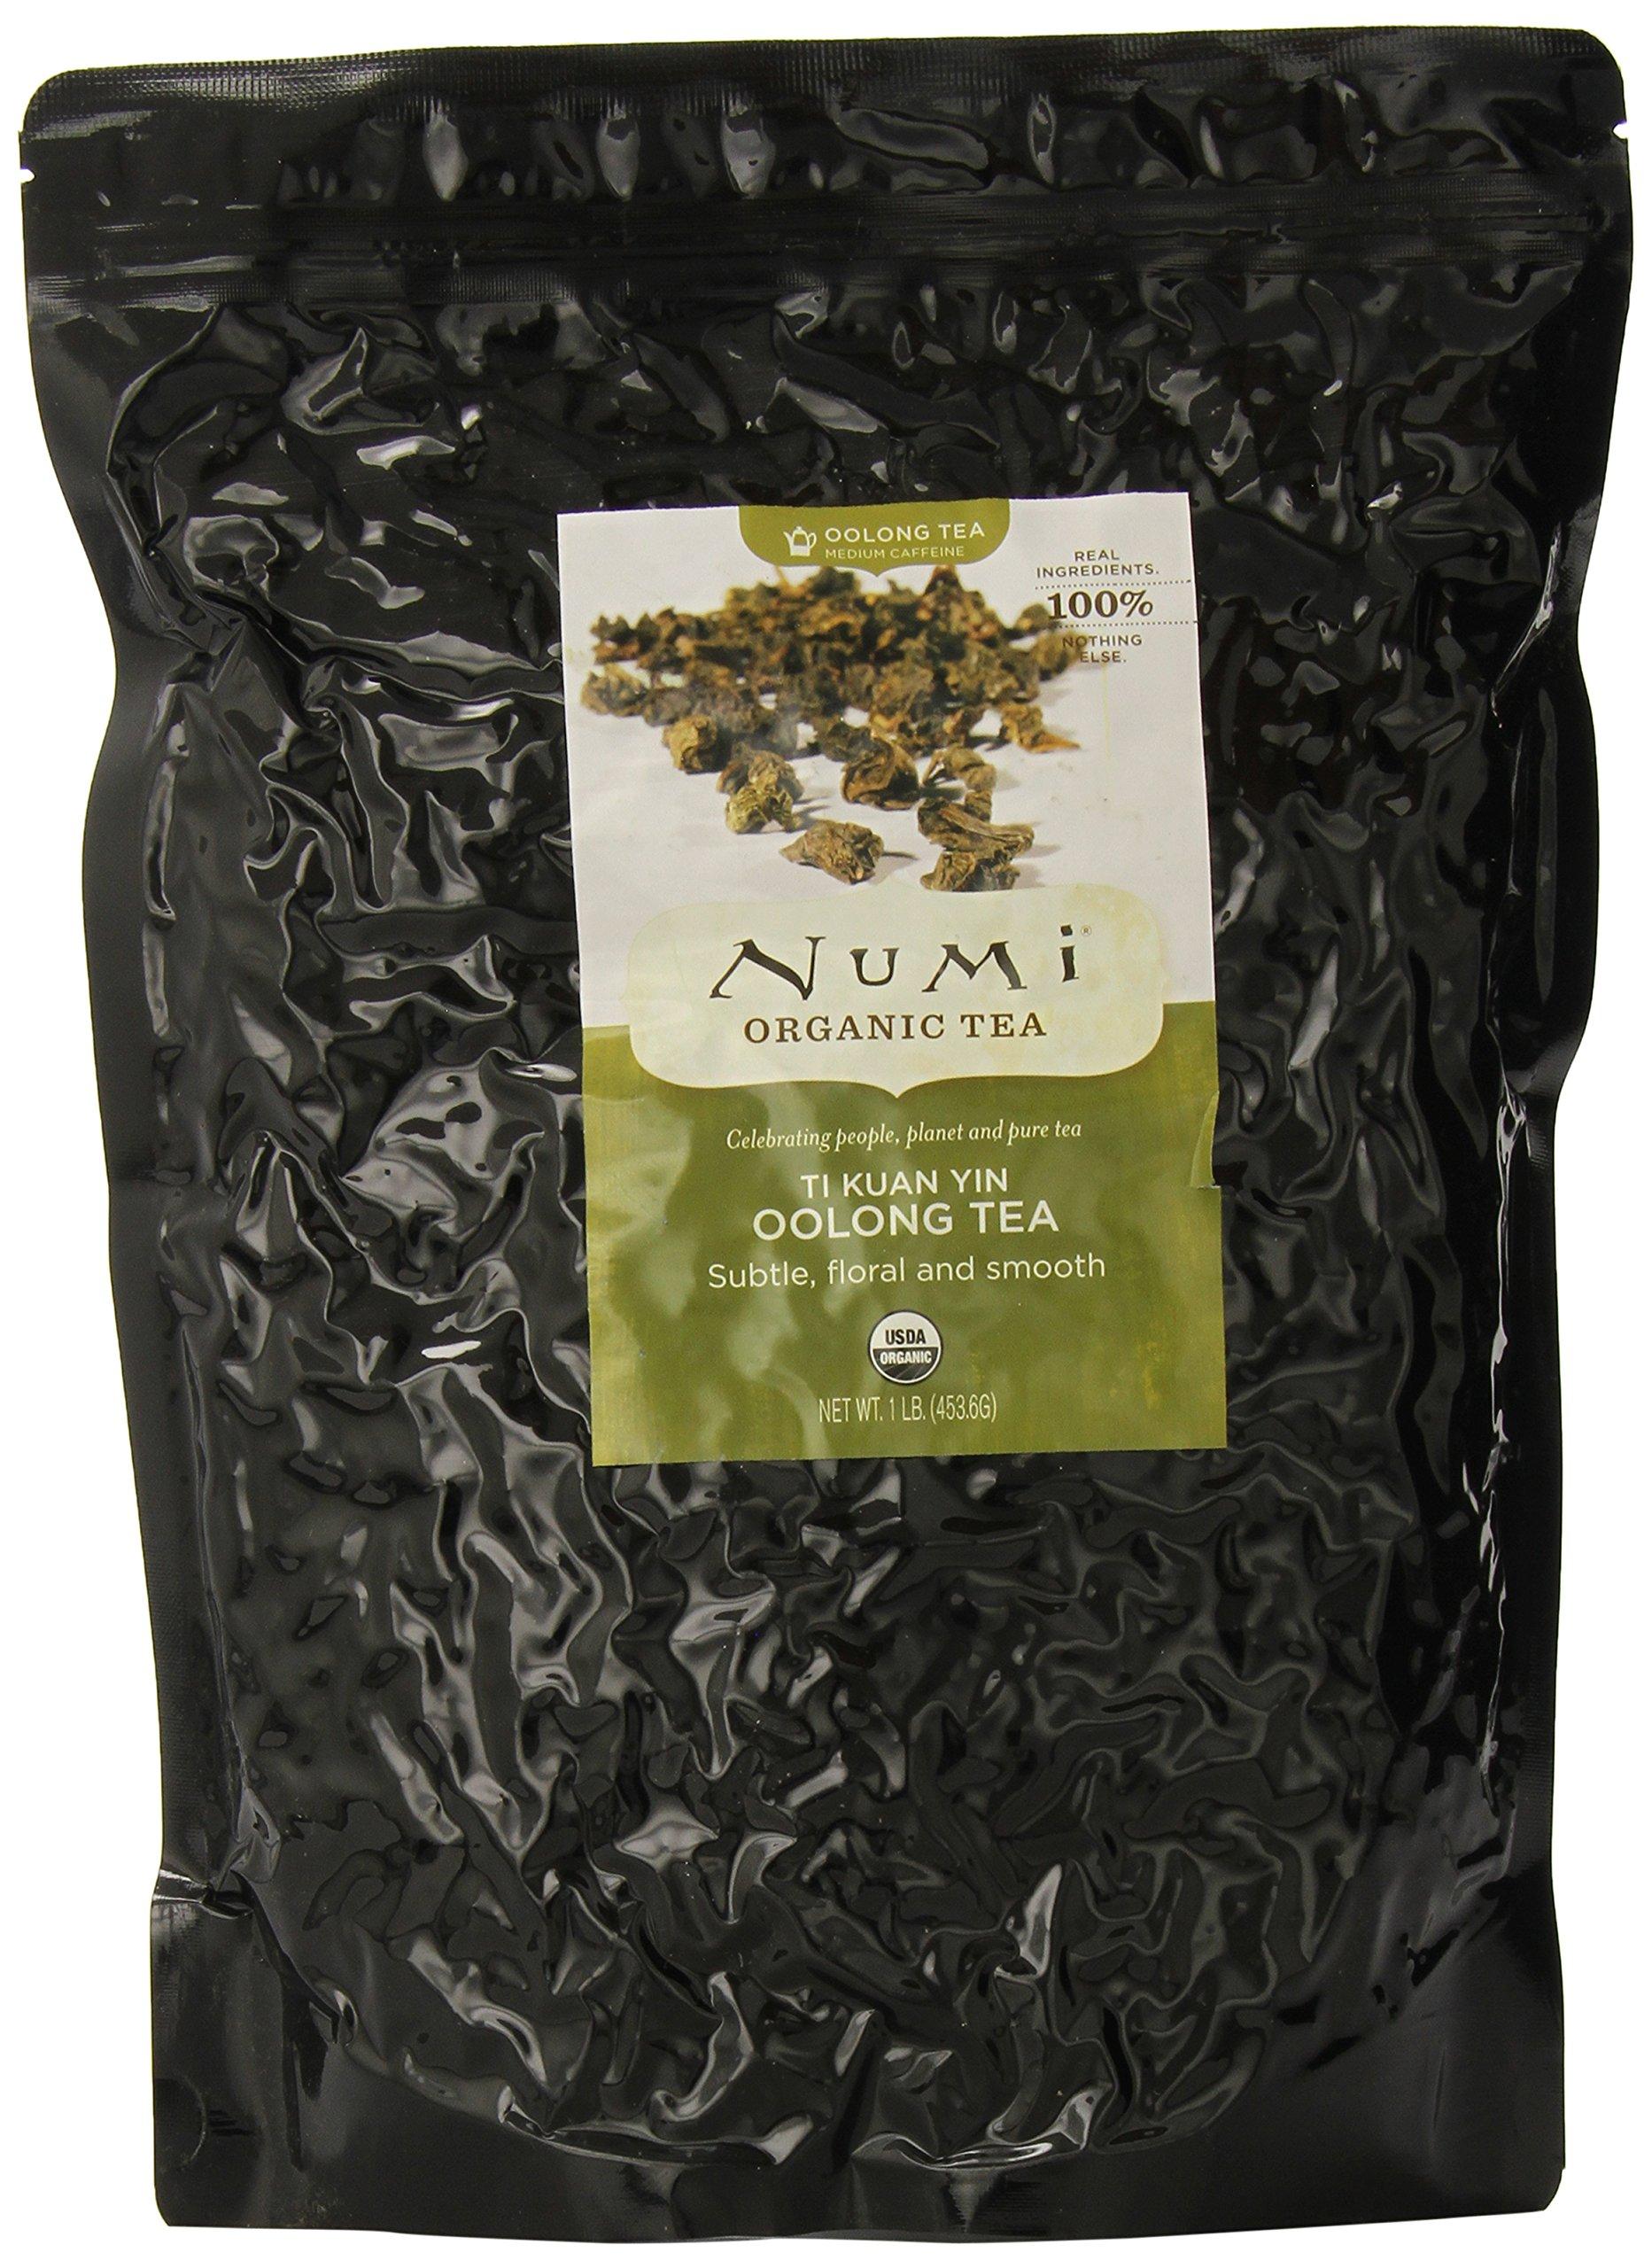 Numi Organic Tea Ti Kuan Yin, 16 Ounce Pouch, Loose Leaf Oolong Tea by Numi